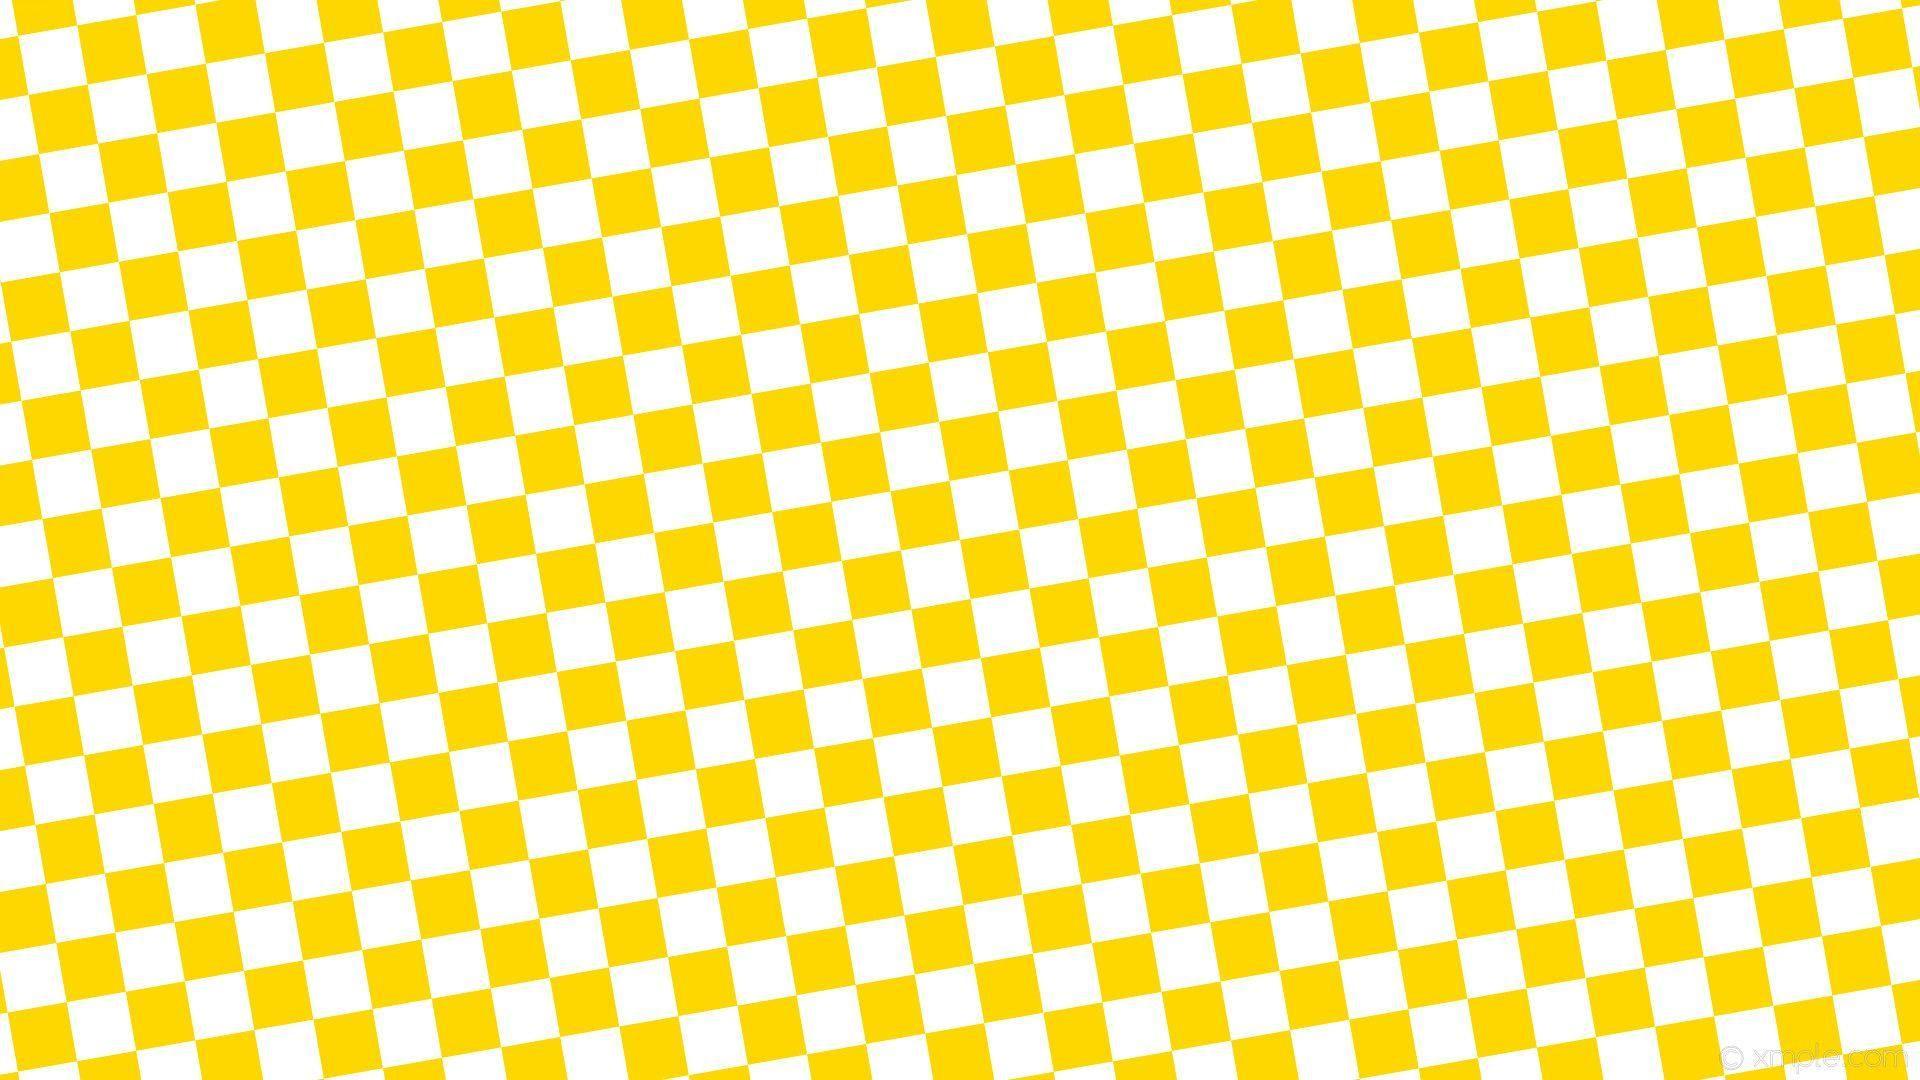 Vsco Wallpaper For Laptop Wallpaper Nice In 2020 Cute Desktop Wallpaper Yellow Aesthetic Yellow Wallpaper